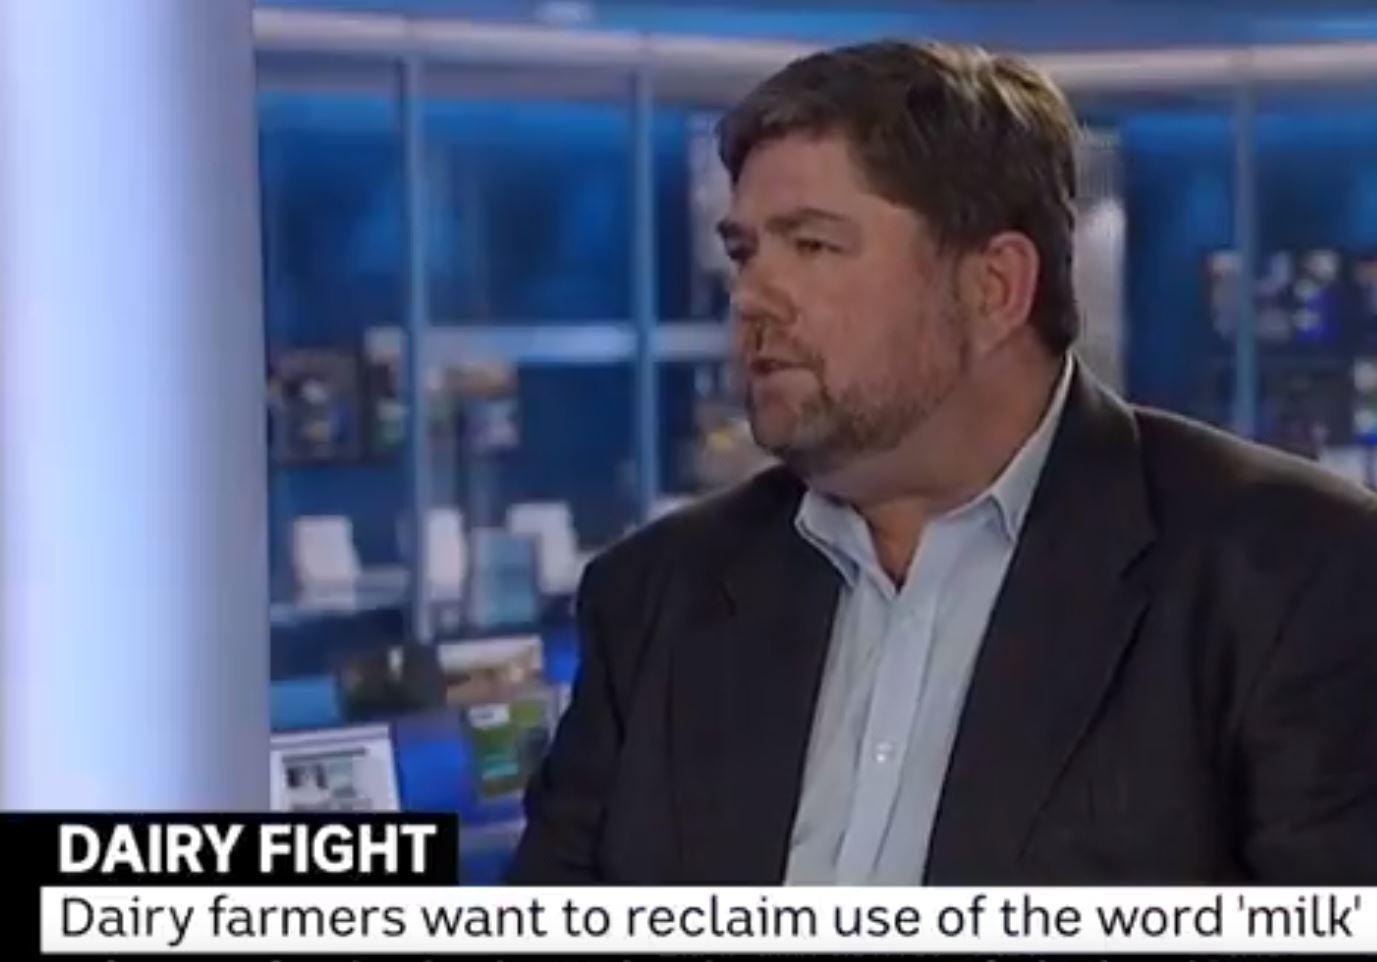 ABC NEWS 24, October 10 2017